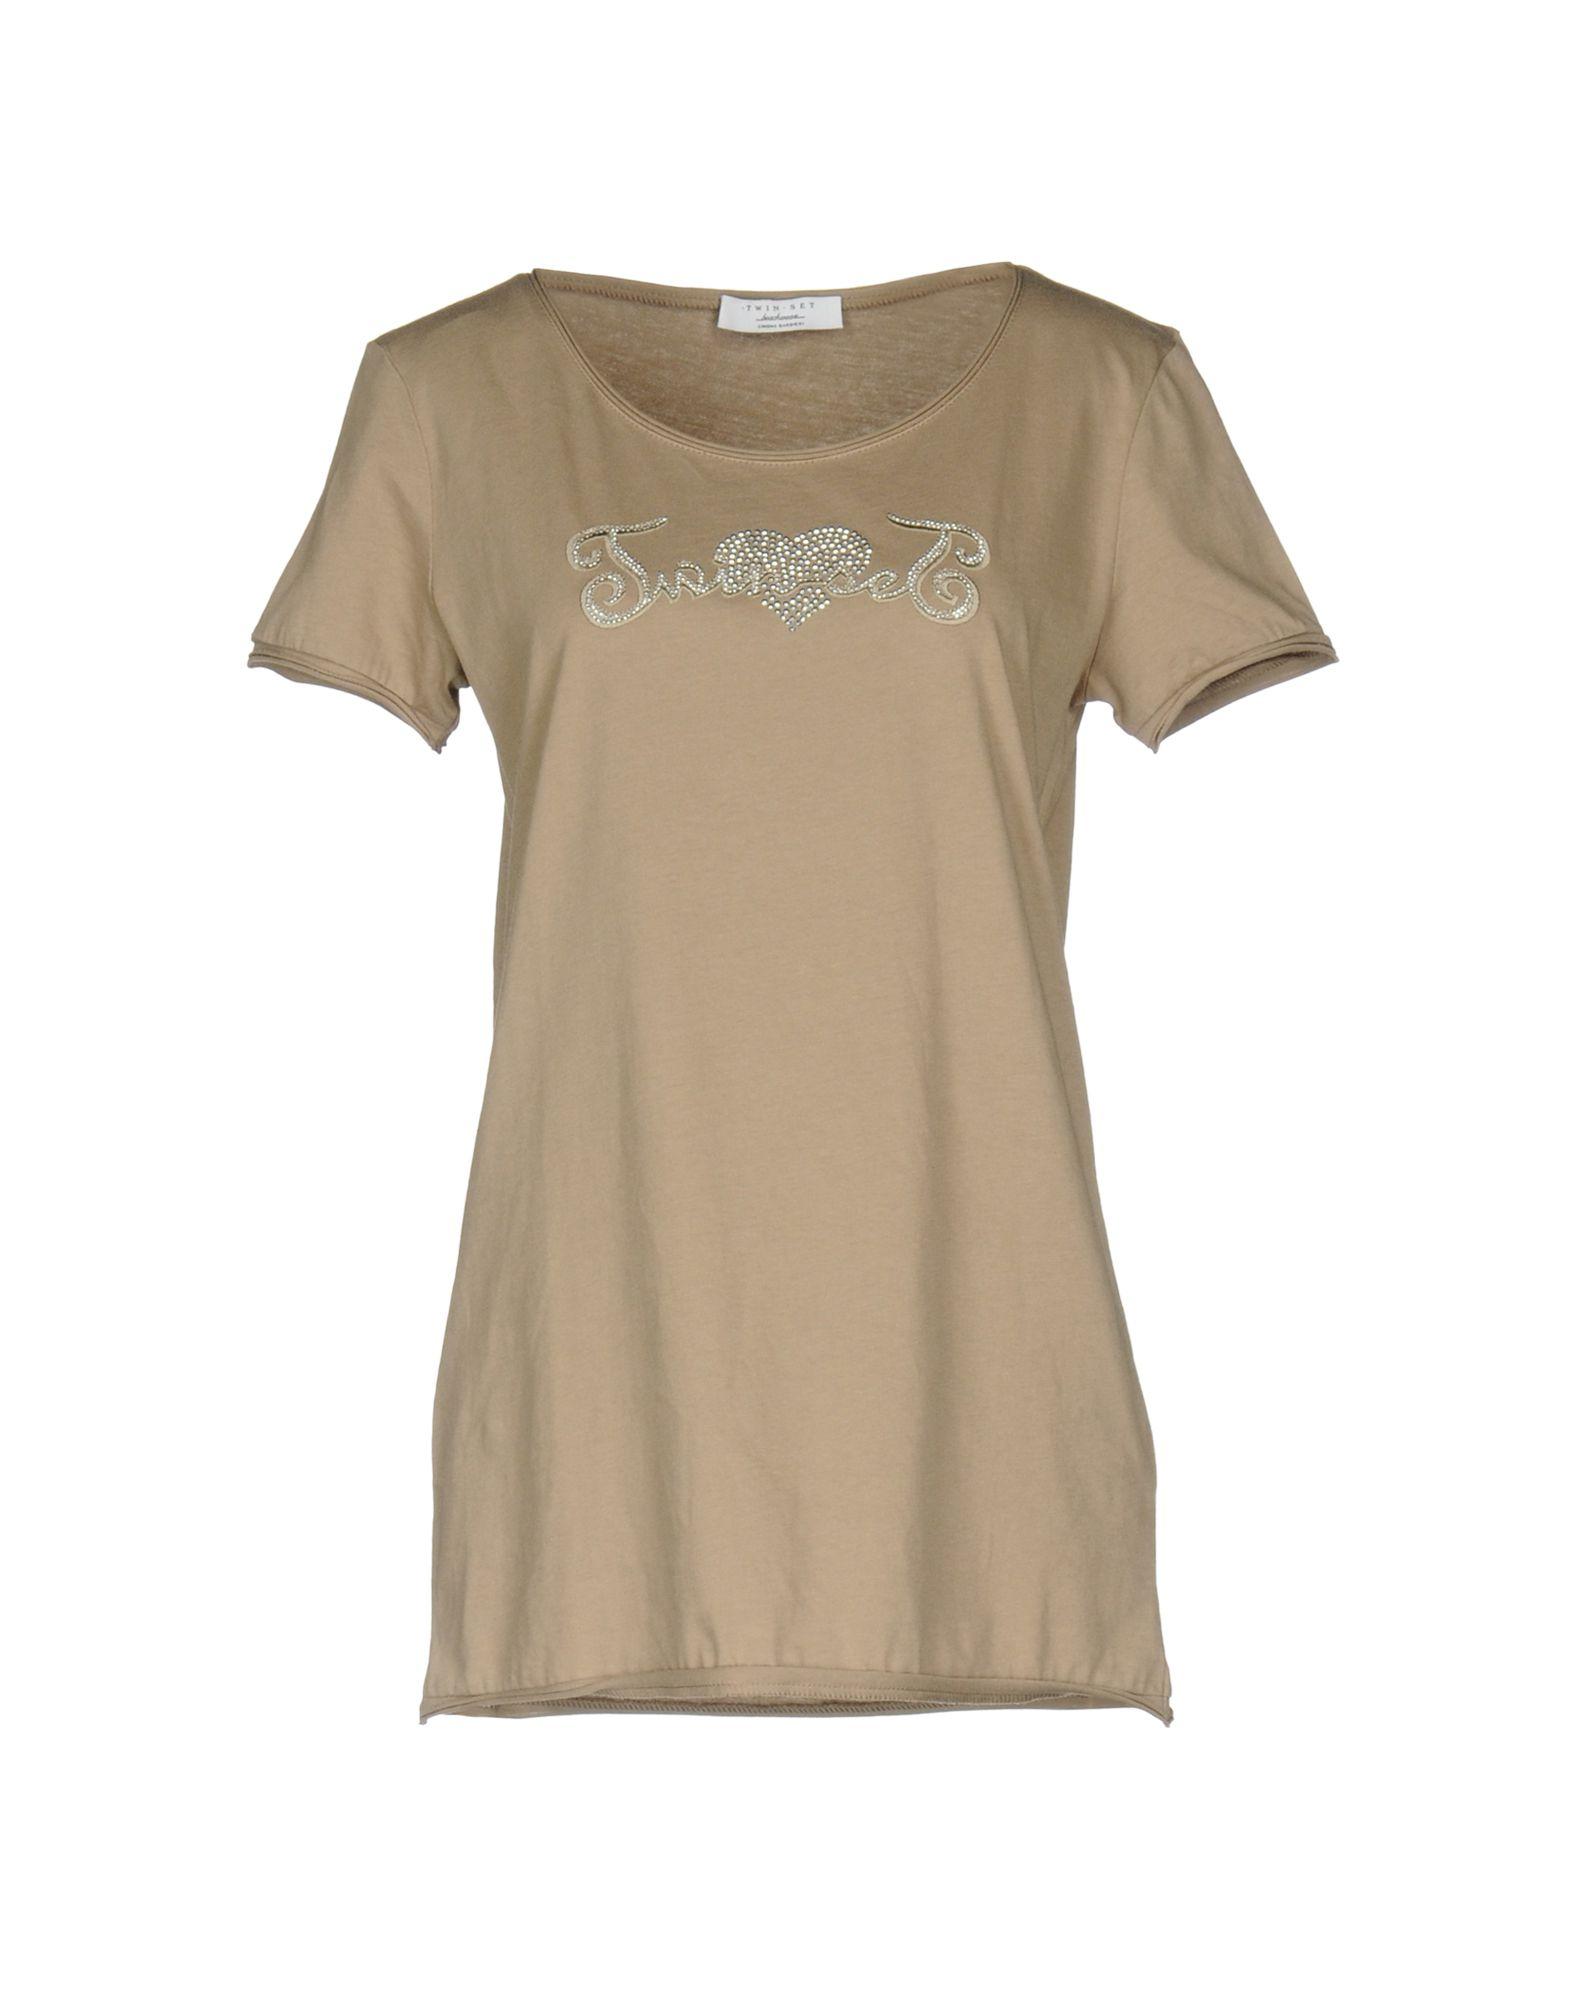 TWIN-SET Simona Barbieri Damen T-shirts Farbe Khaki Größe 4 jetztbilligerkaufen